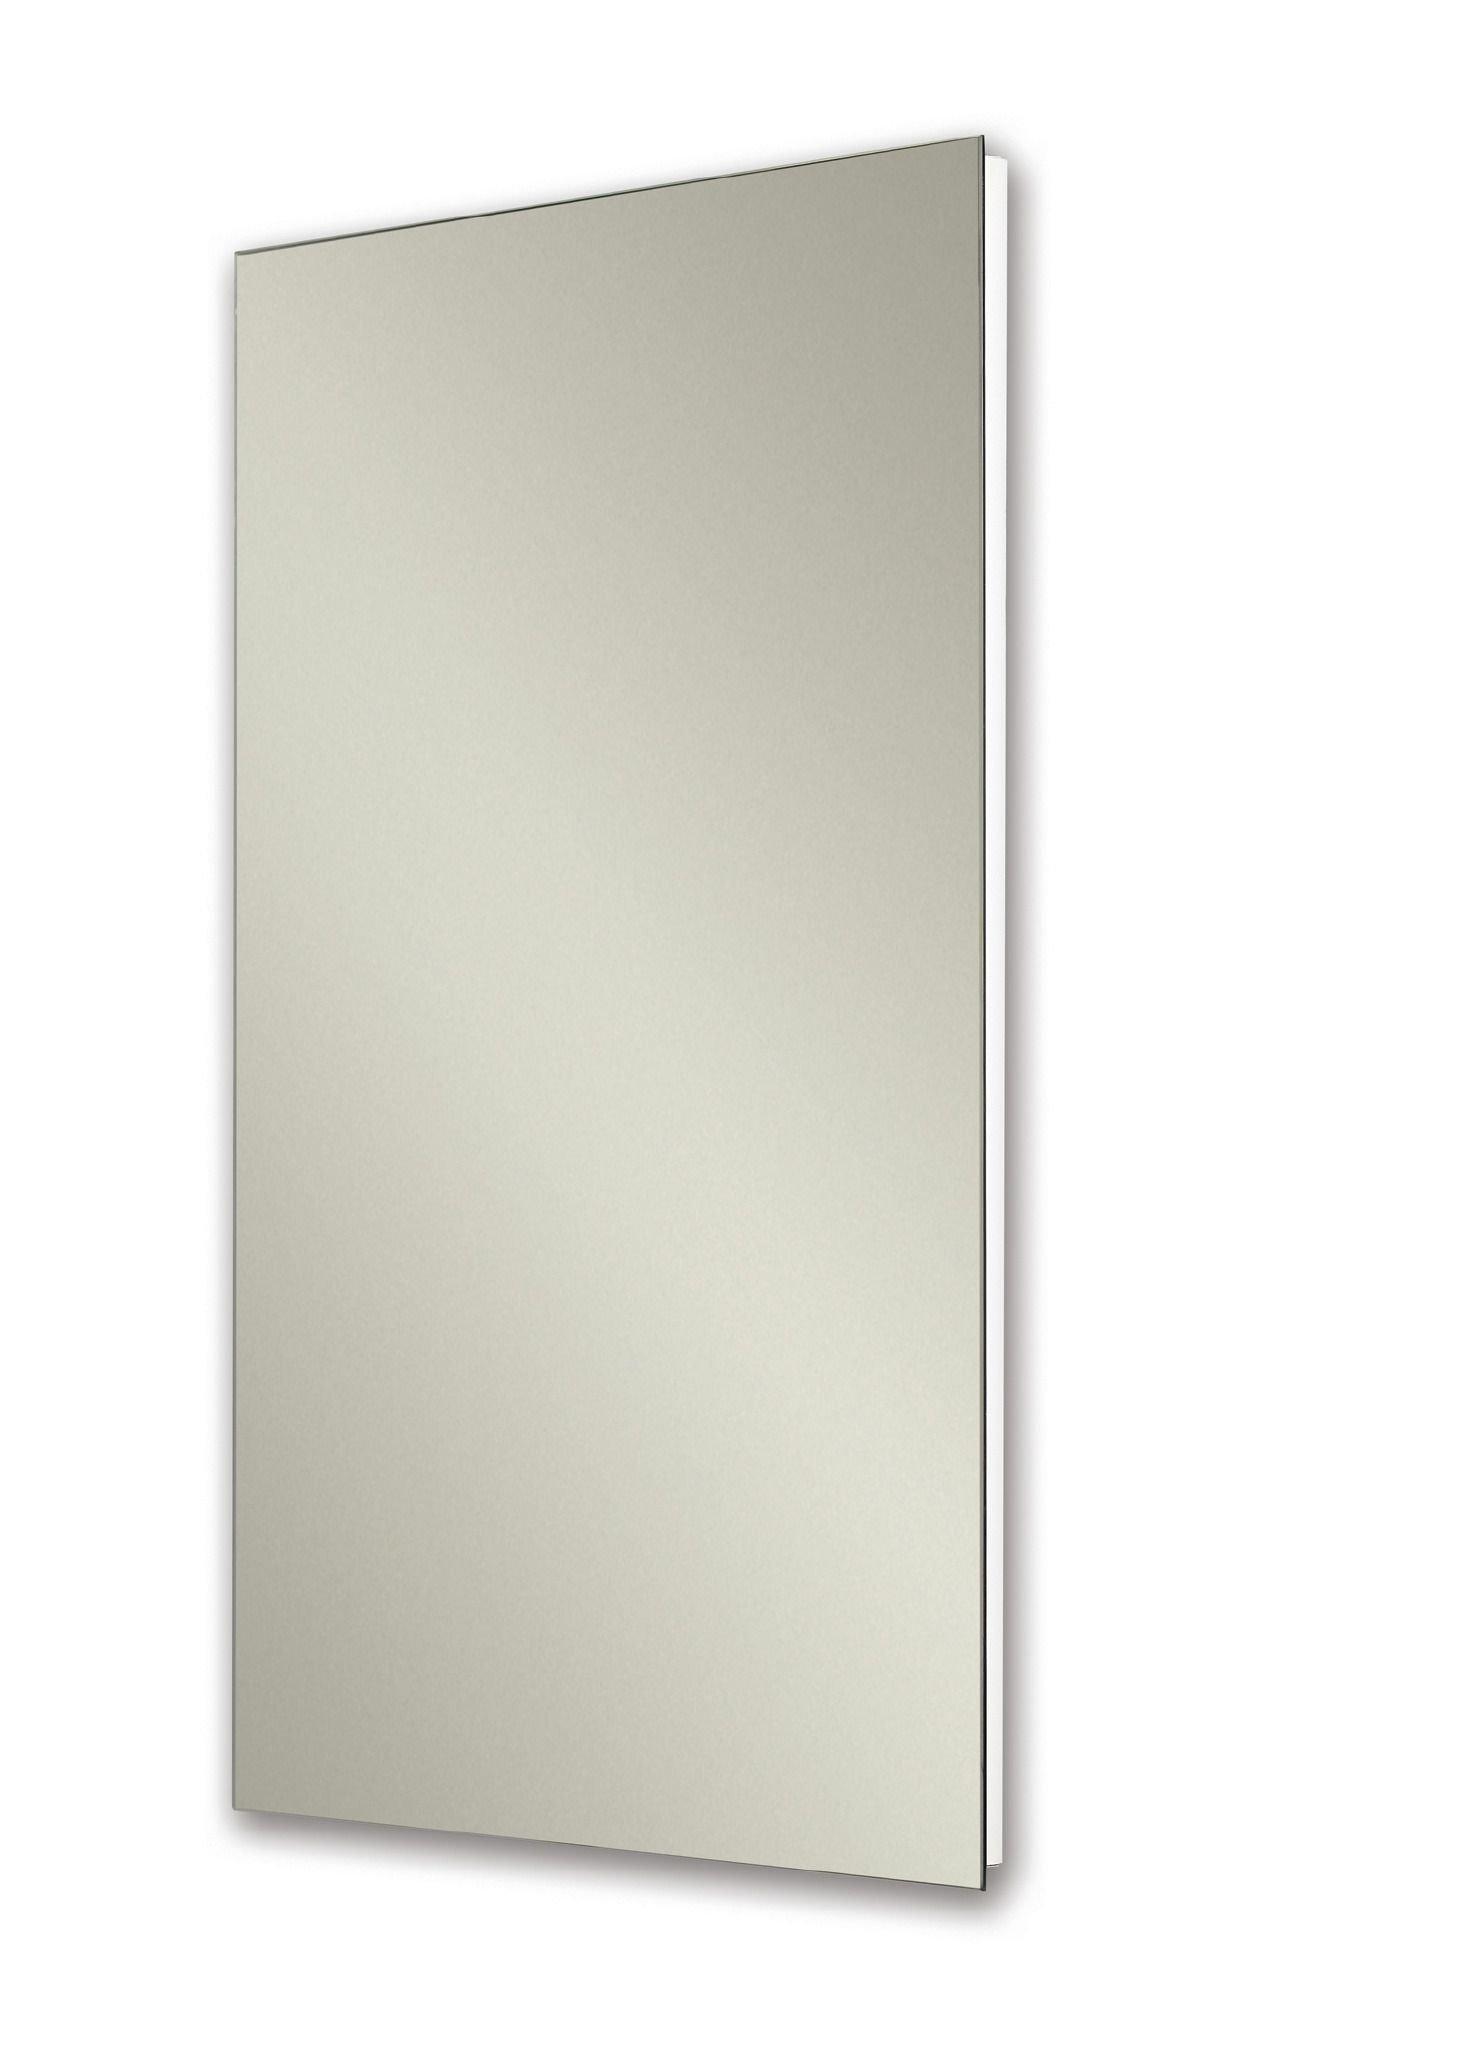 Jensen 1035p24whgx Polished Edge Mirror Medicine Cabinet